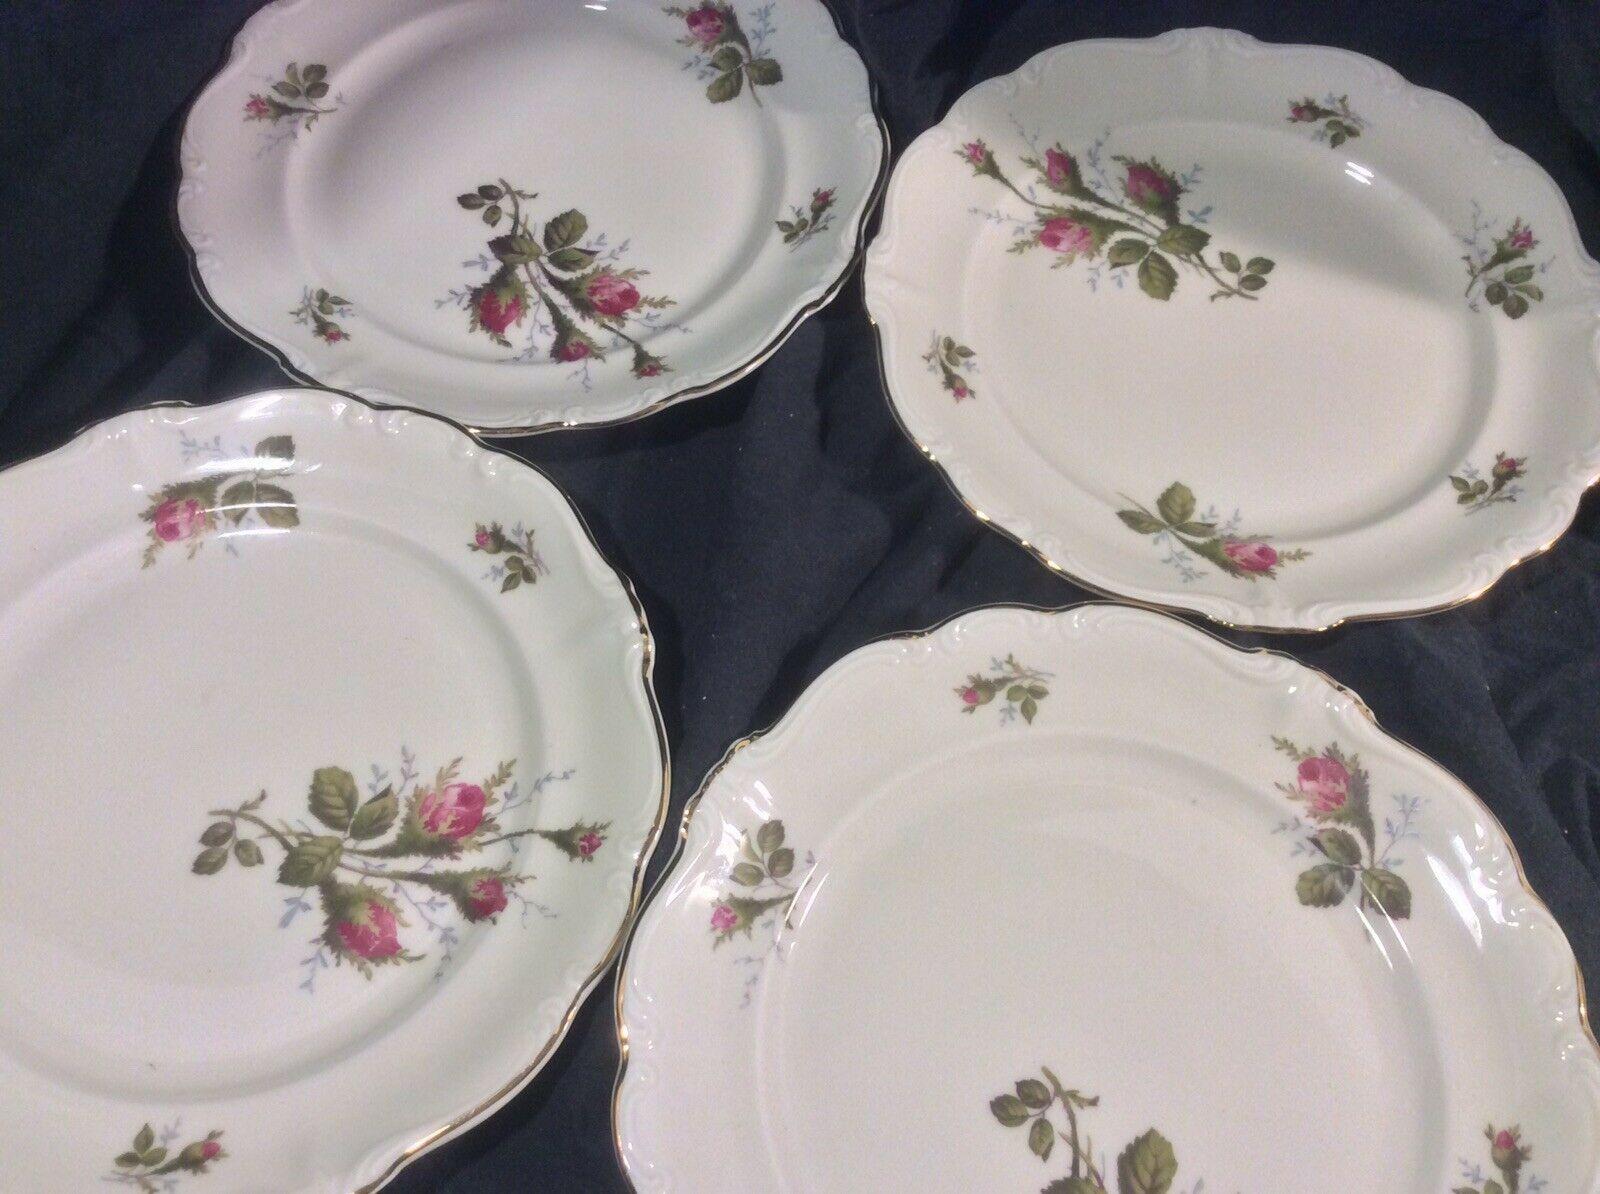 Rosenthal Pompadour Moss Rose - Salad Plates - Set Of 4 - $24.99